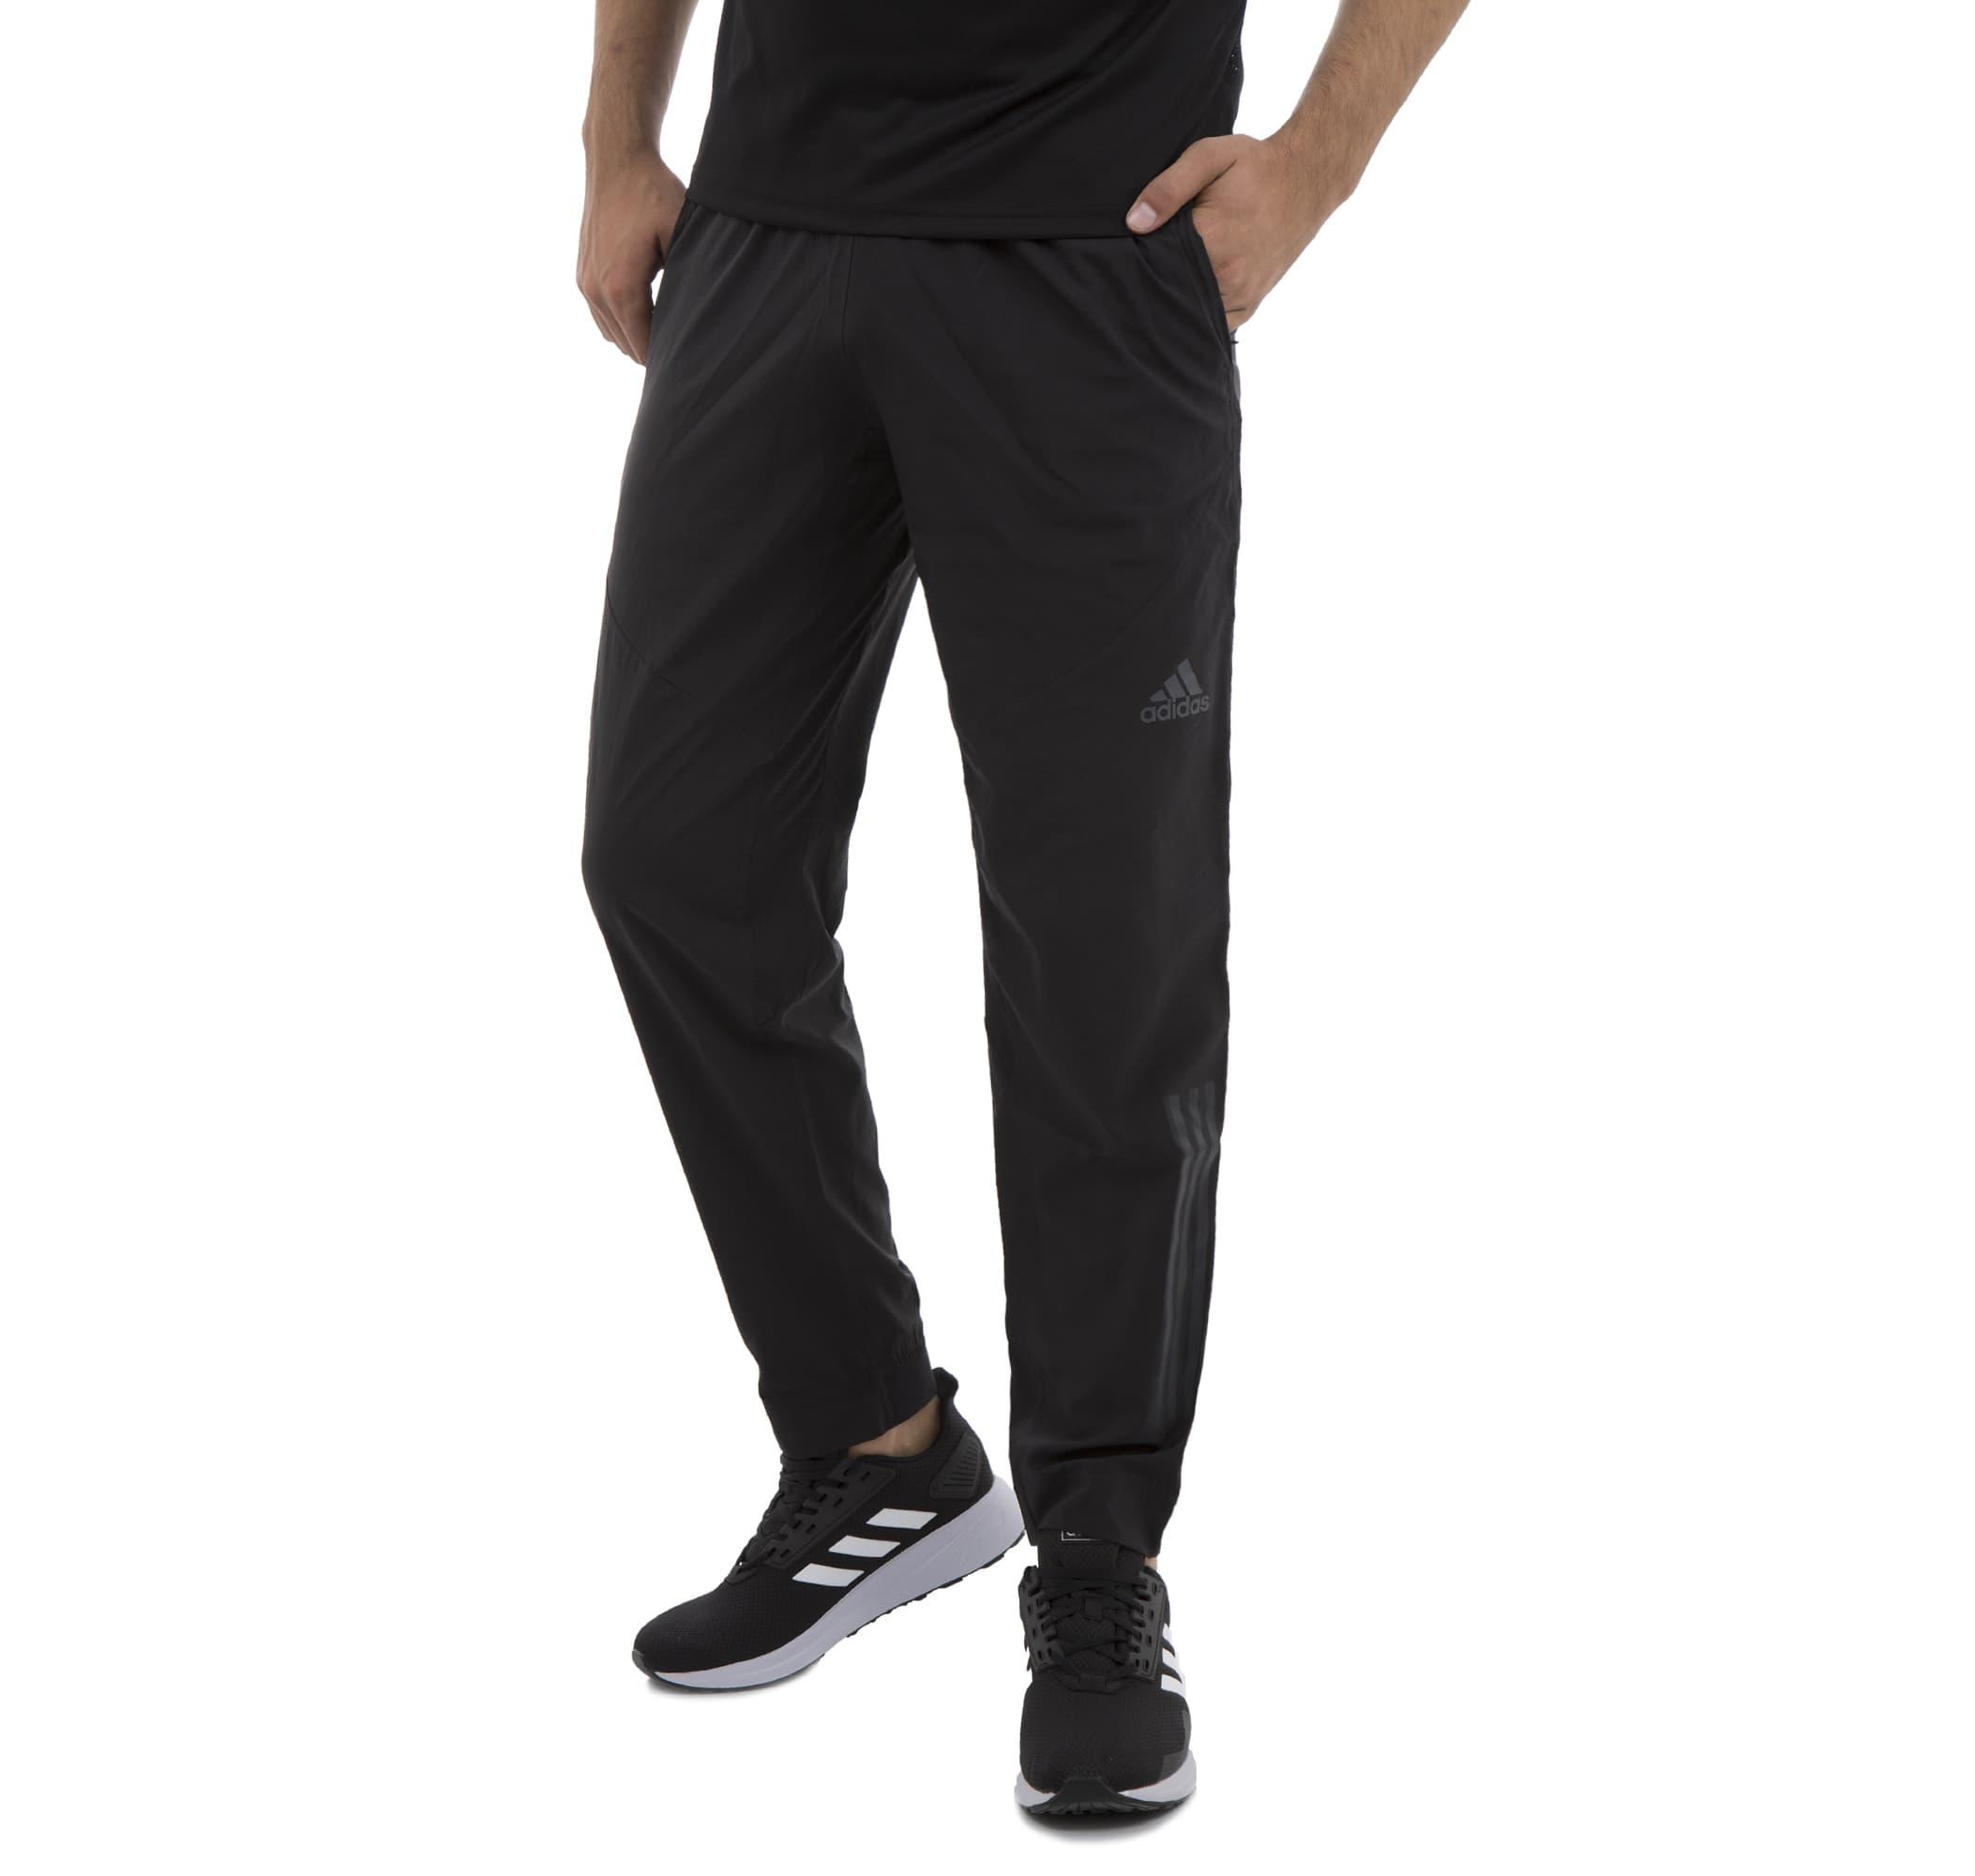 Climacool Workout Erkek Siyah Eşofman Altı (CG1506)